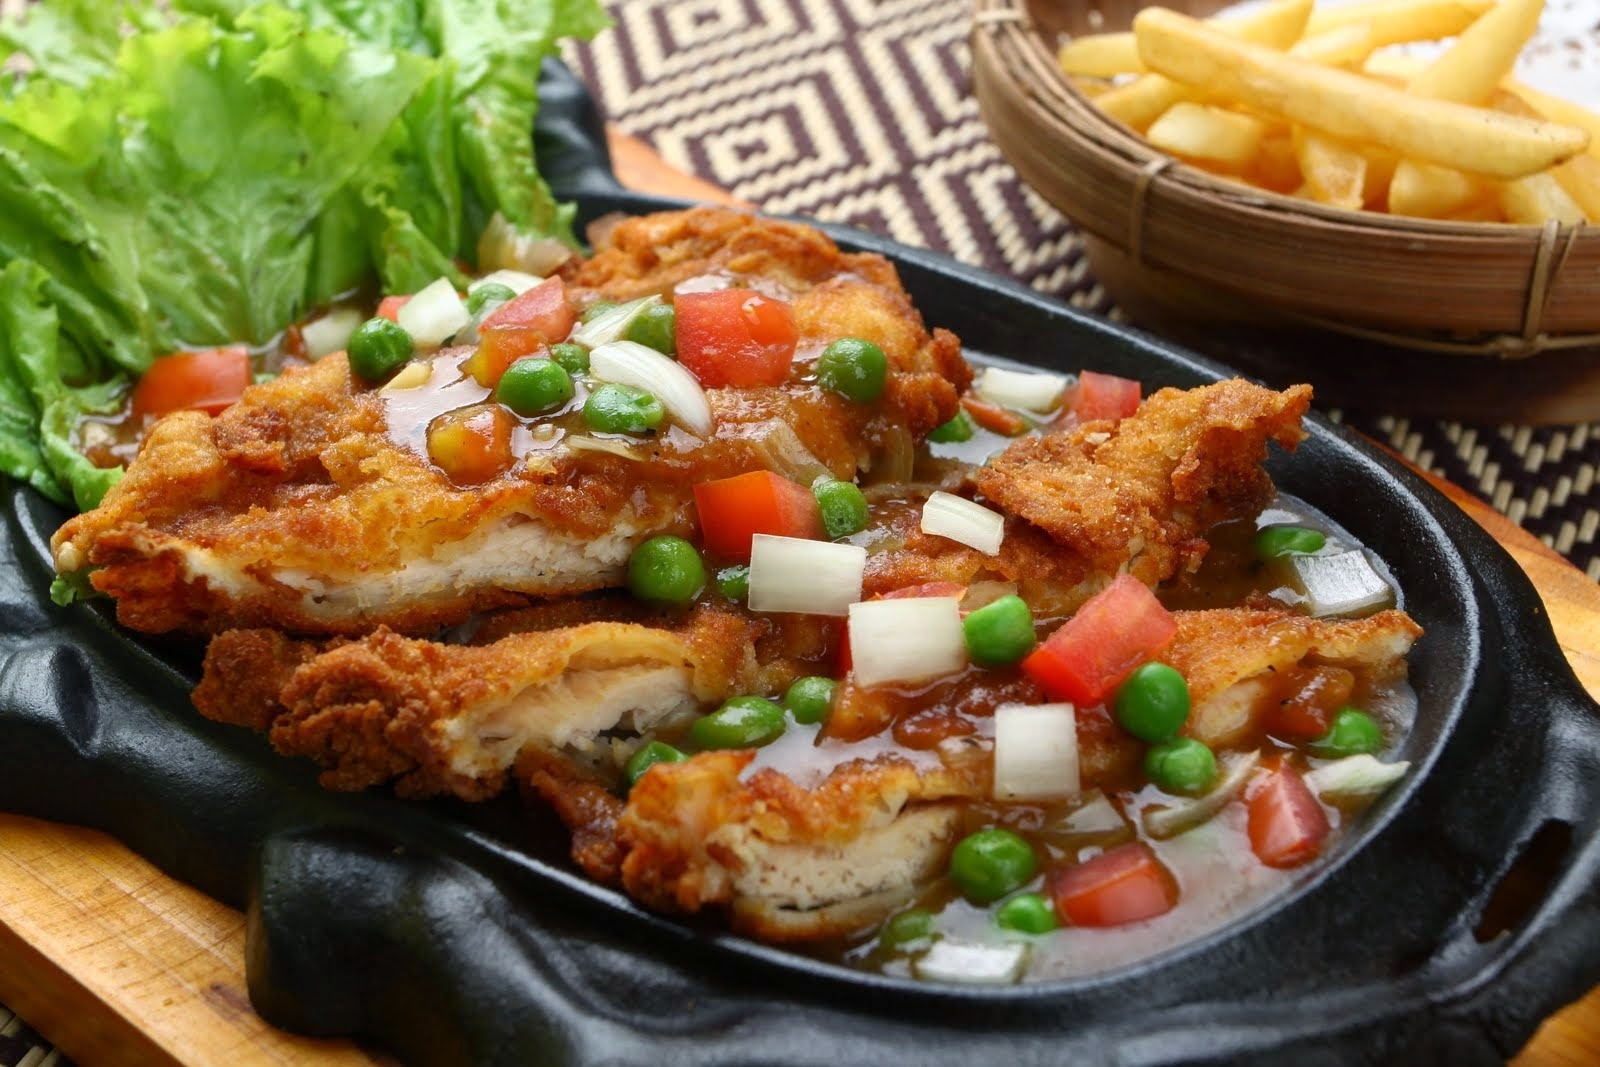 Resep Menu Buka Puasa Cara Membuat Sup Ayam Pelangi